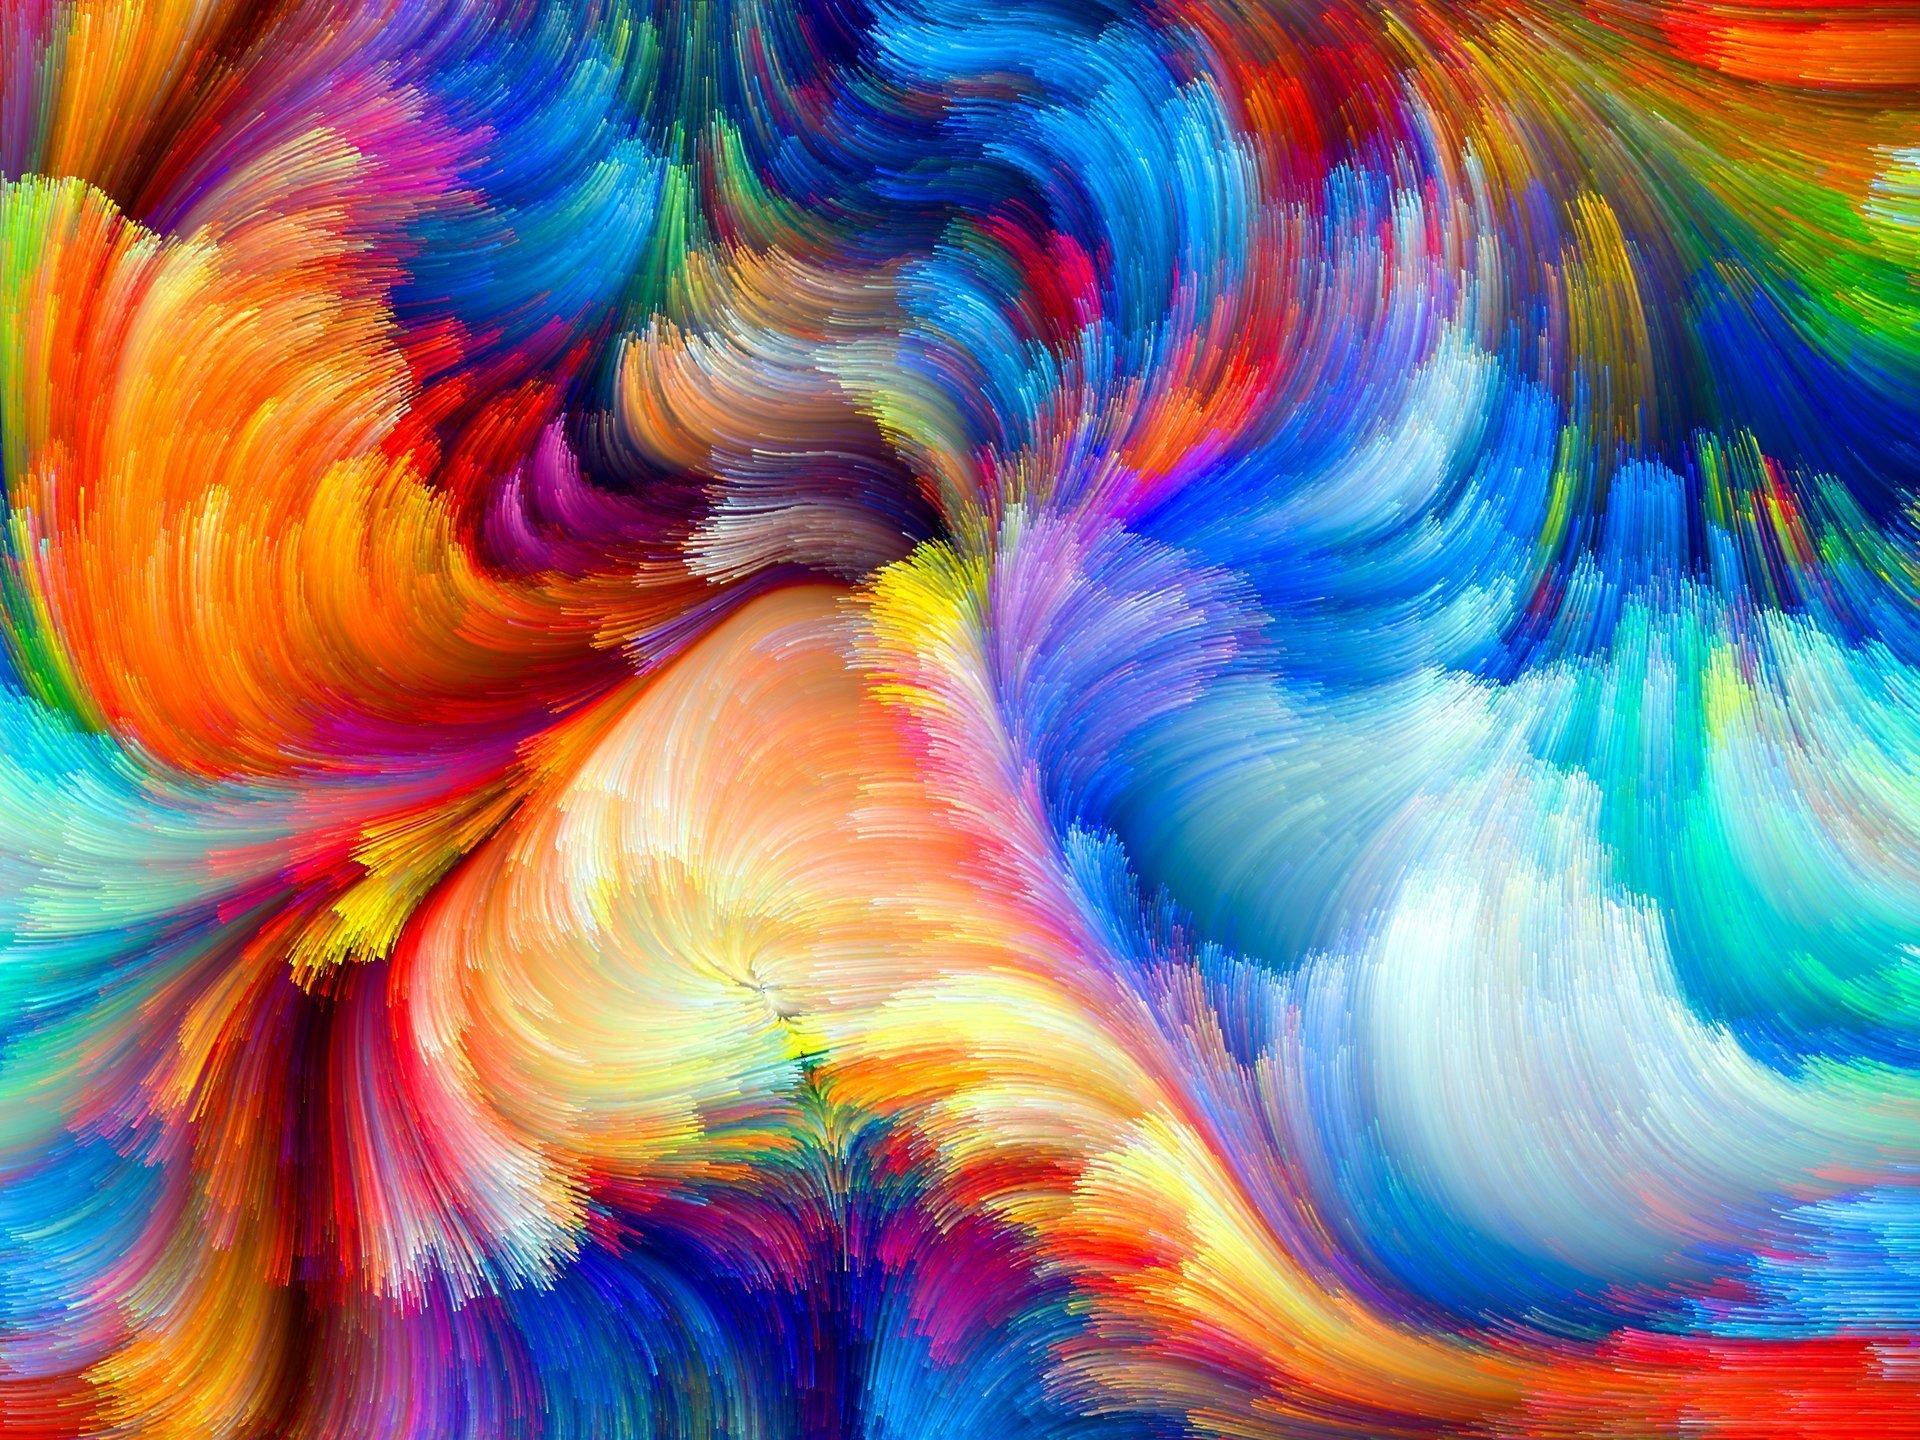 Wallpaper Color Paint - Art Abstract Wallpaper Iphone - HD Wallpaper